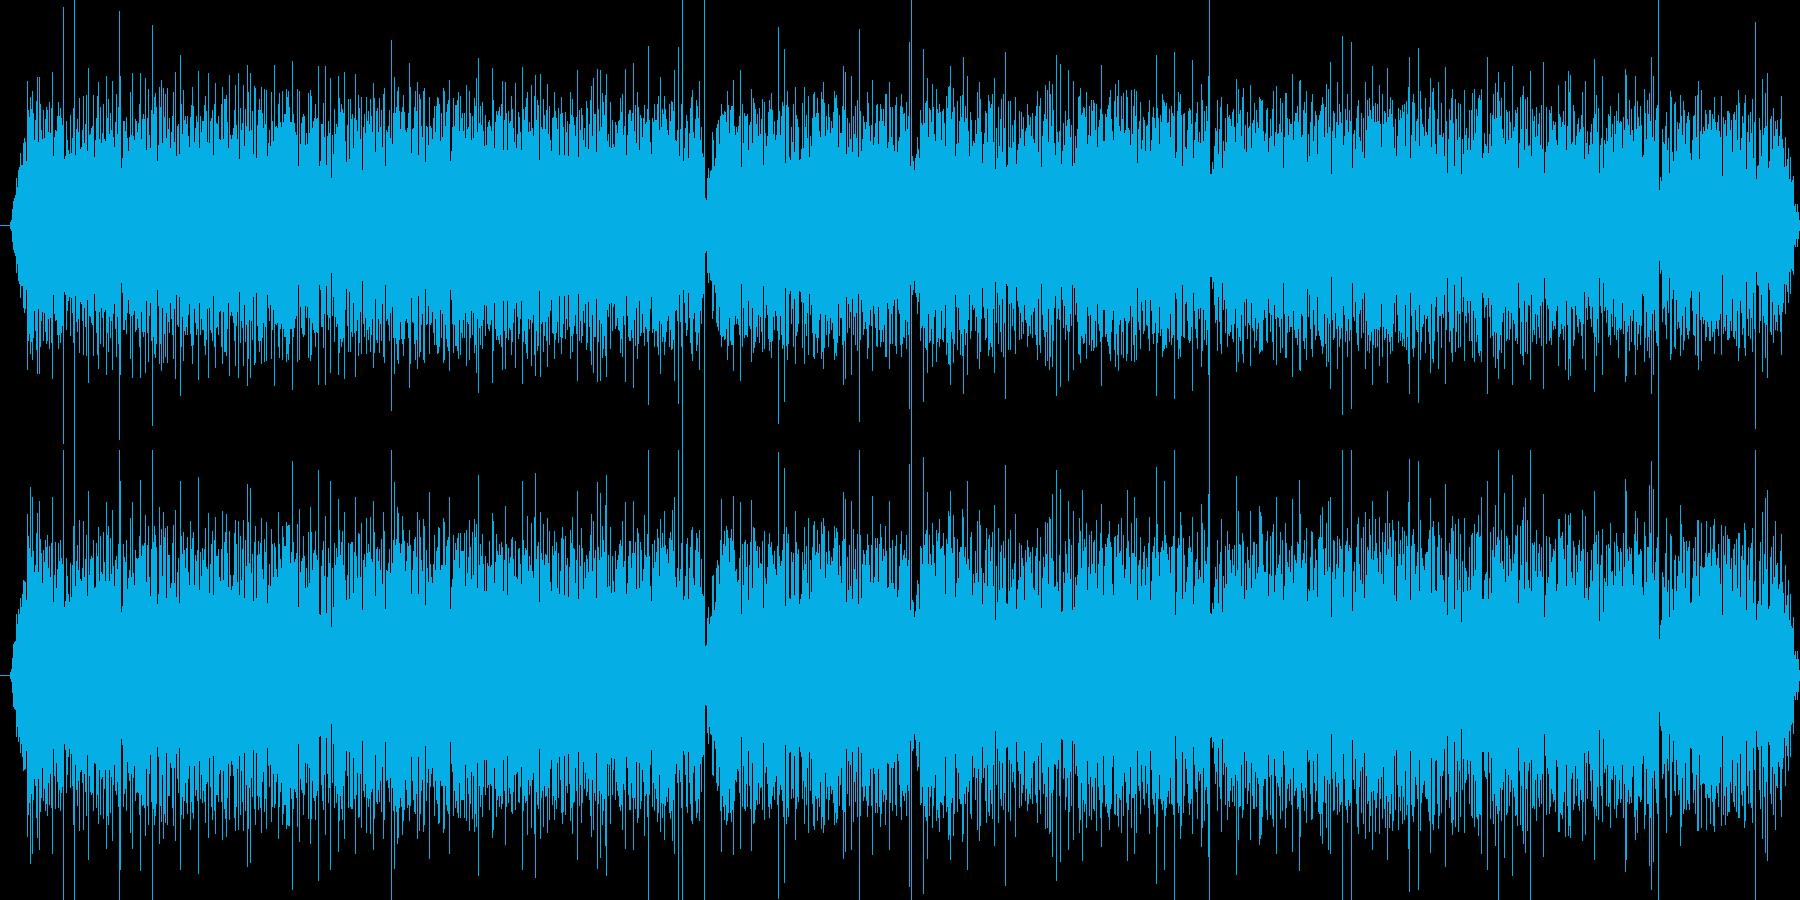 B747の飛行中の音の再生済みの波形